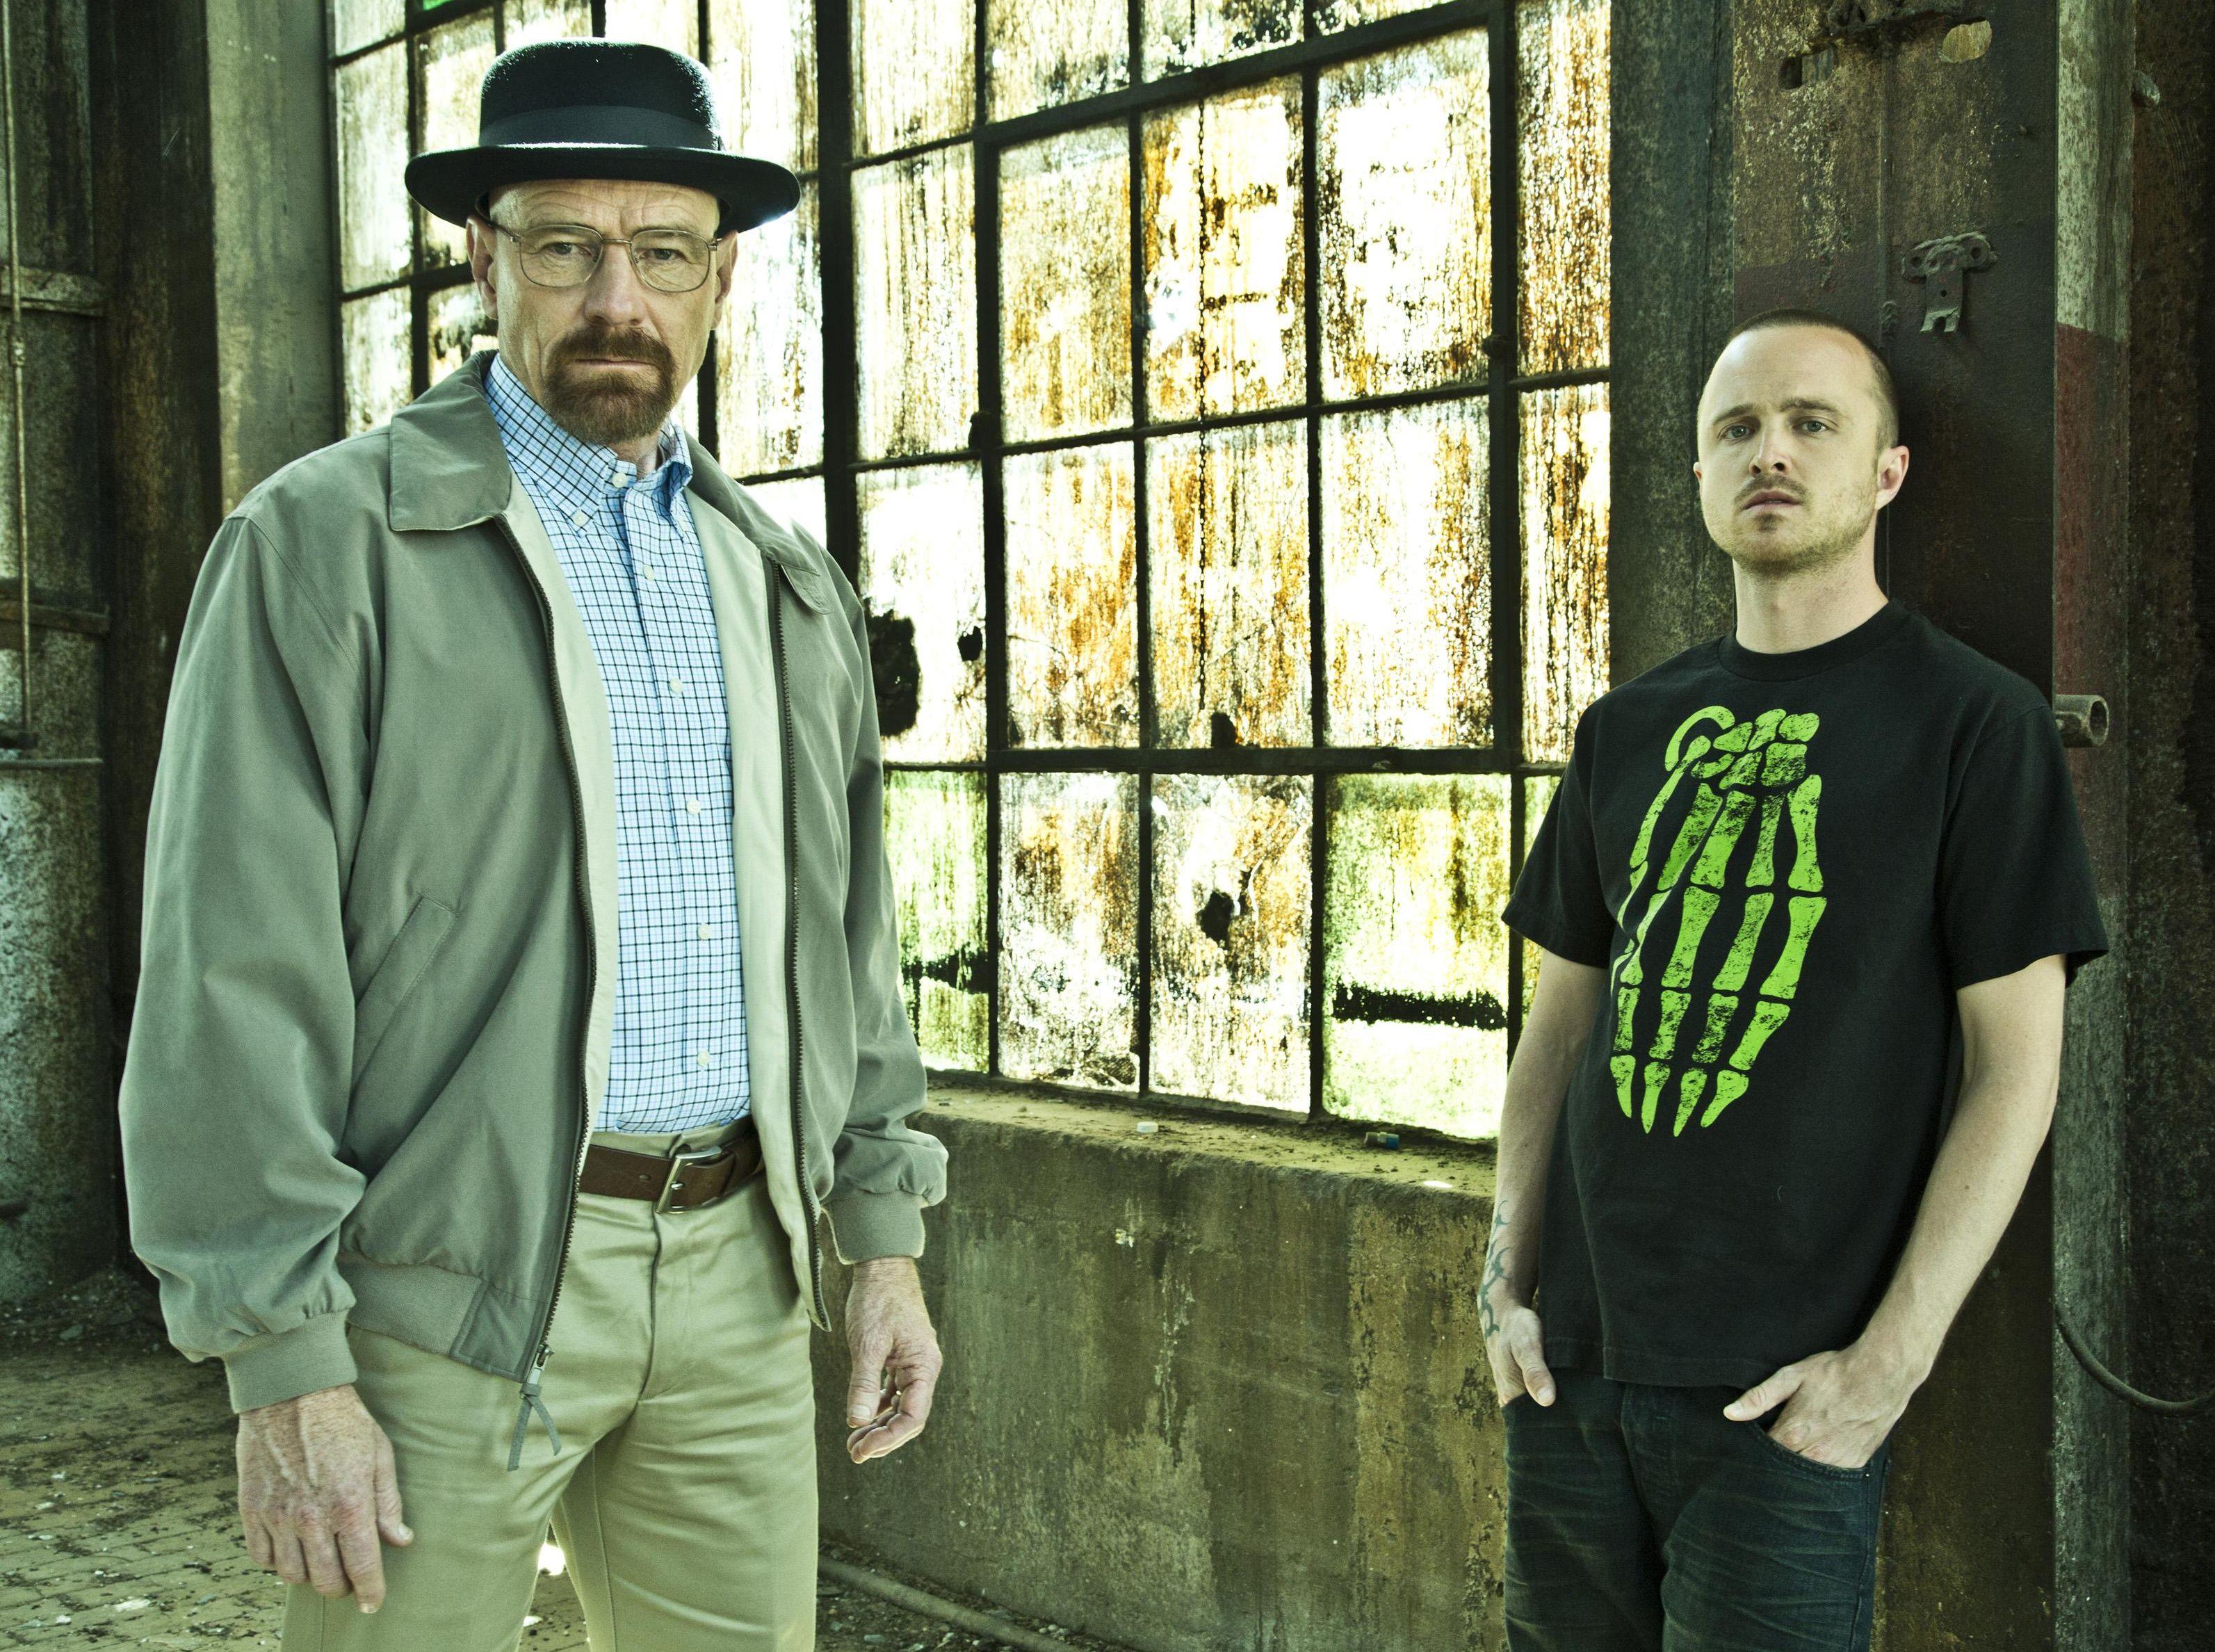 Pinkman and Heisenberg